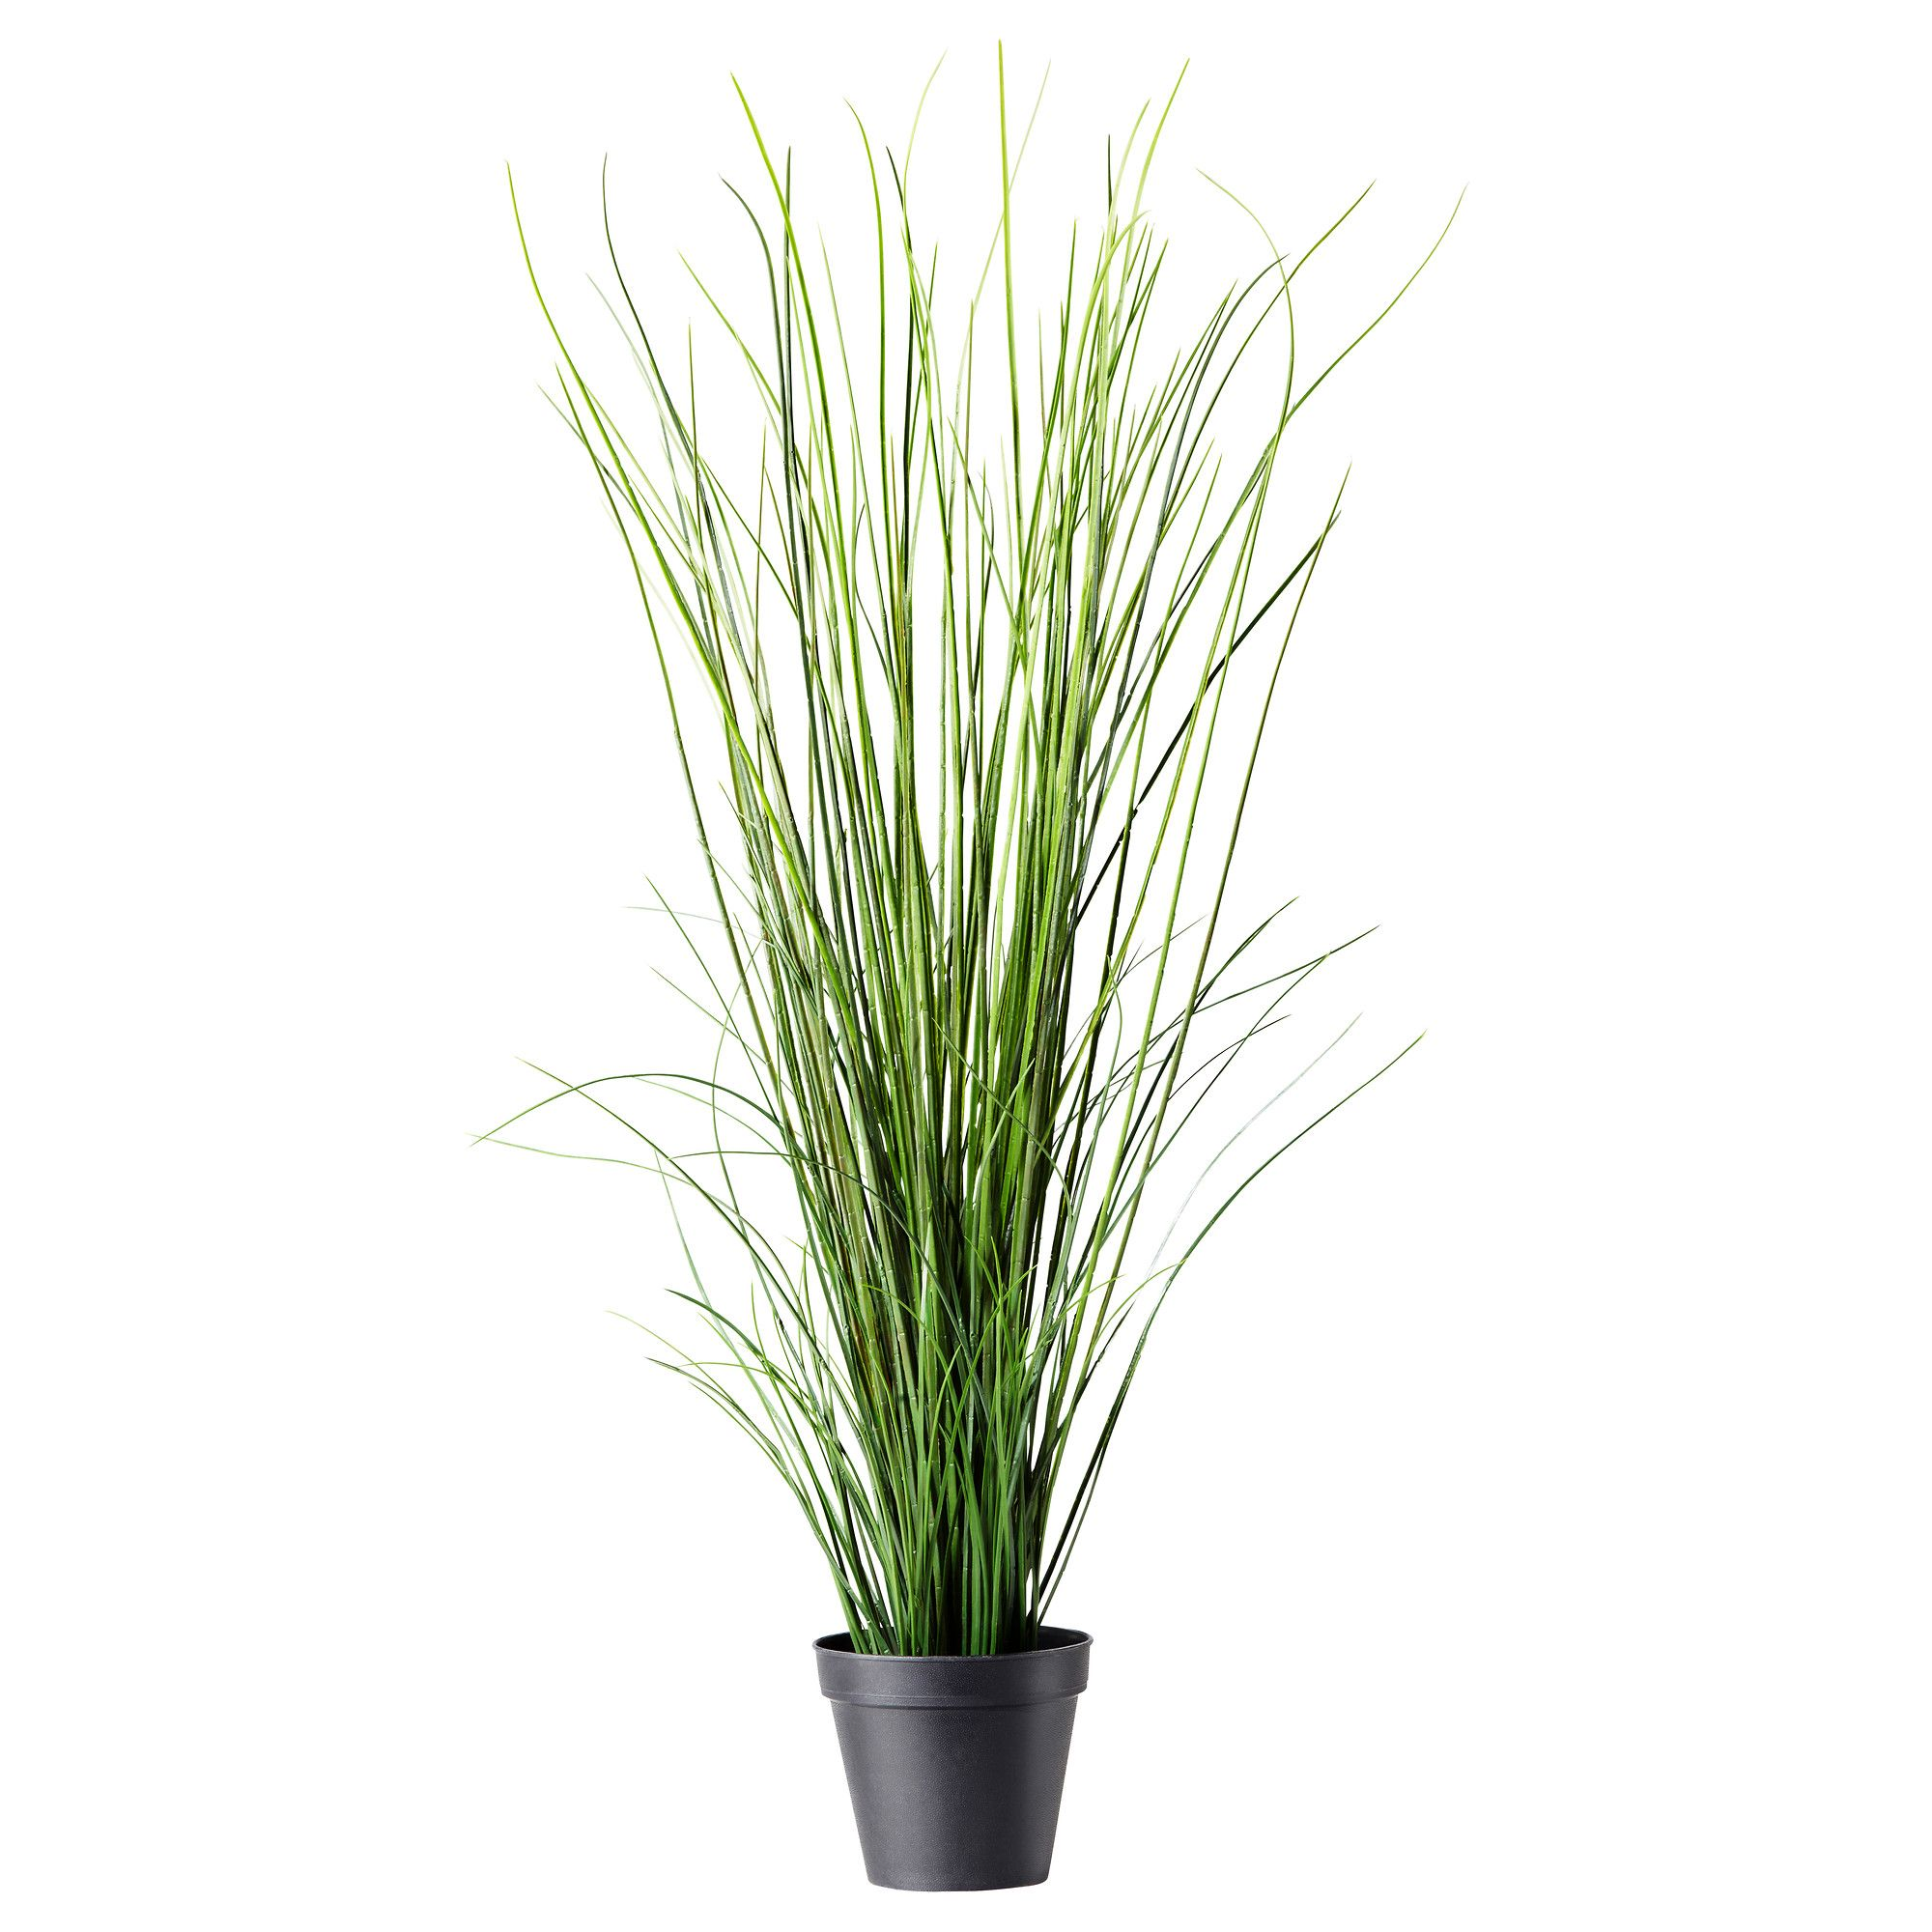 Fejka kunstig potteplante gress fake plants office for Long grass plants